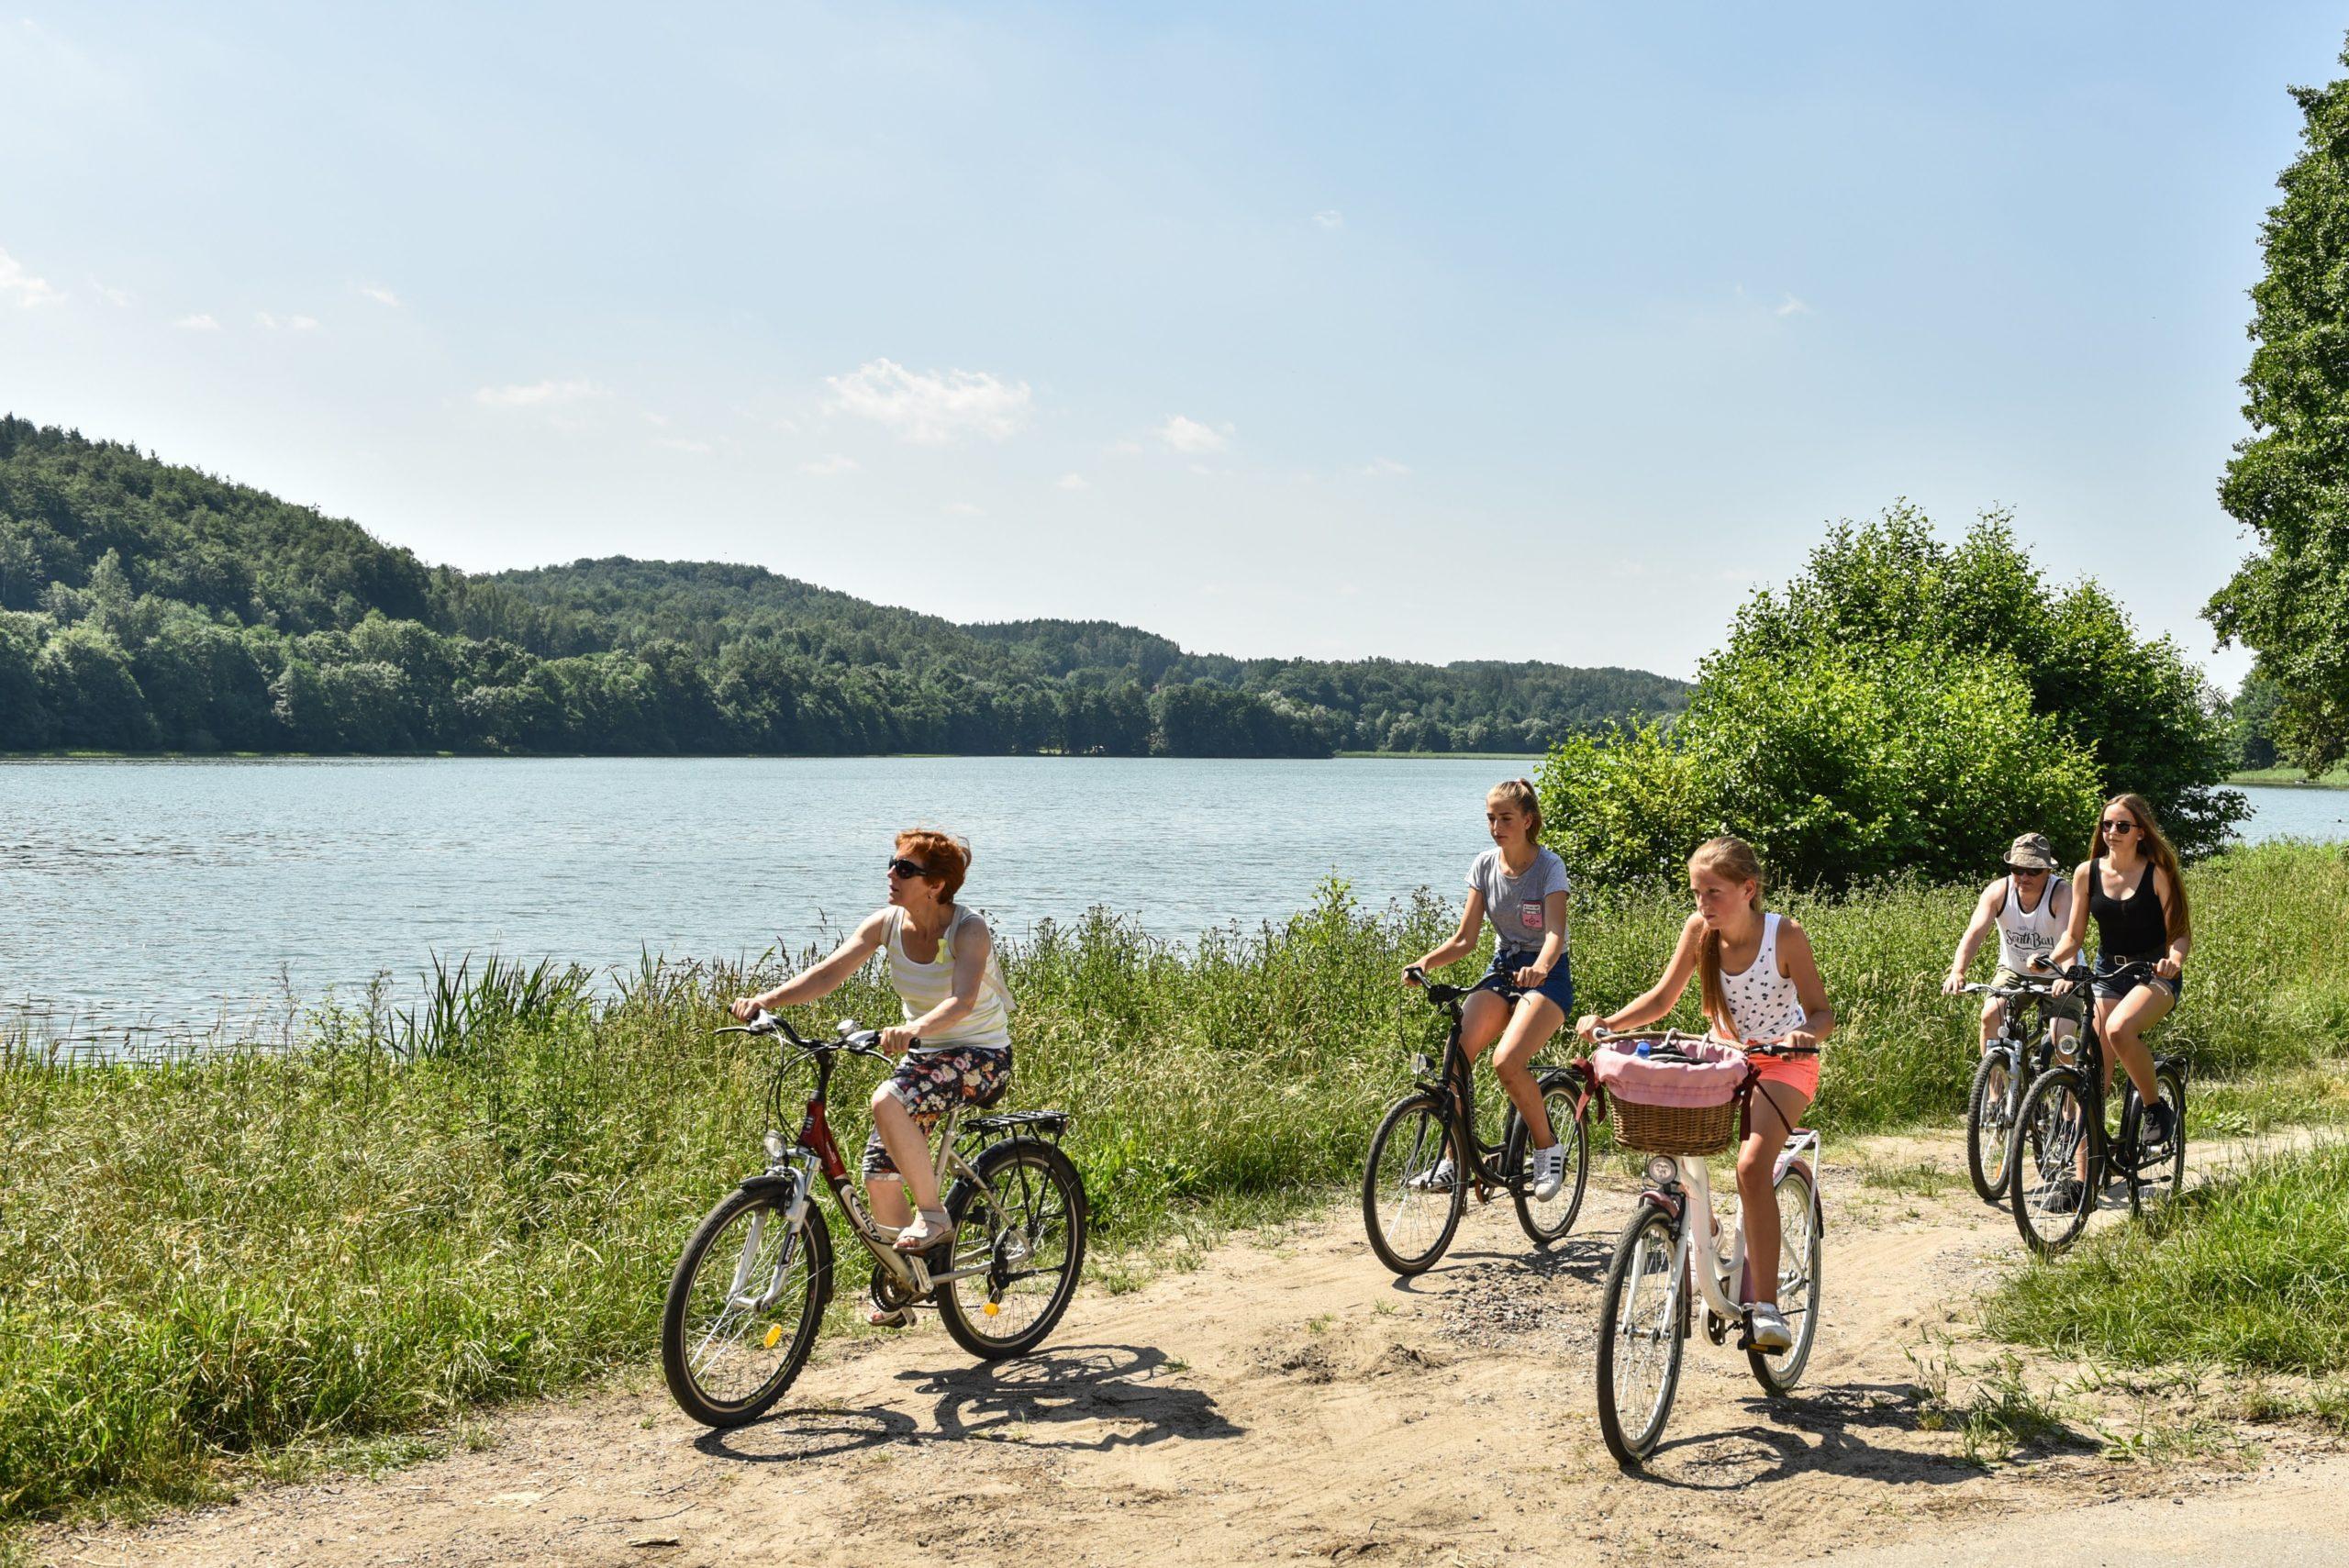 szlaki rowerowe scaled Onas